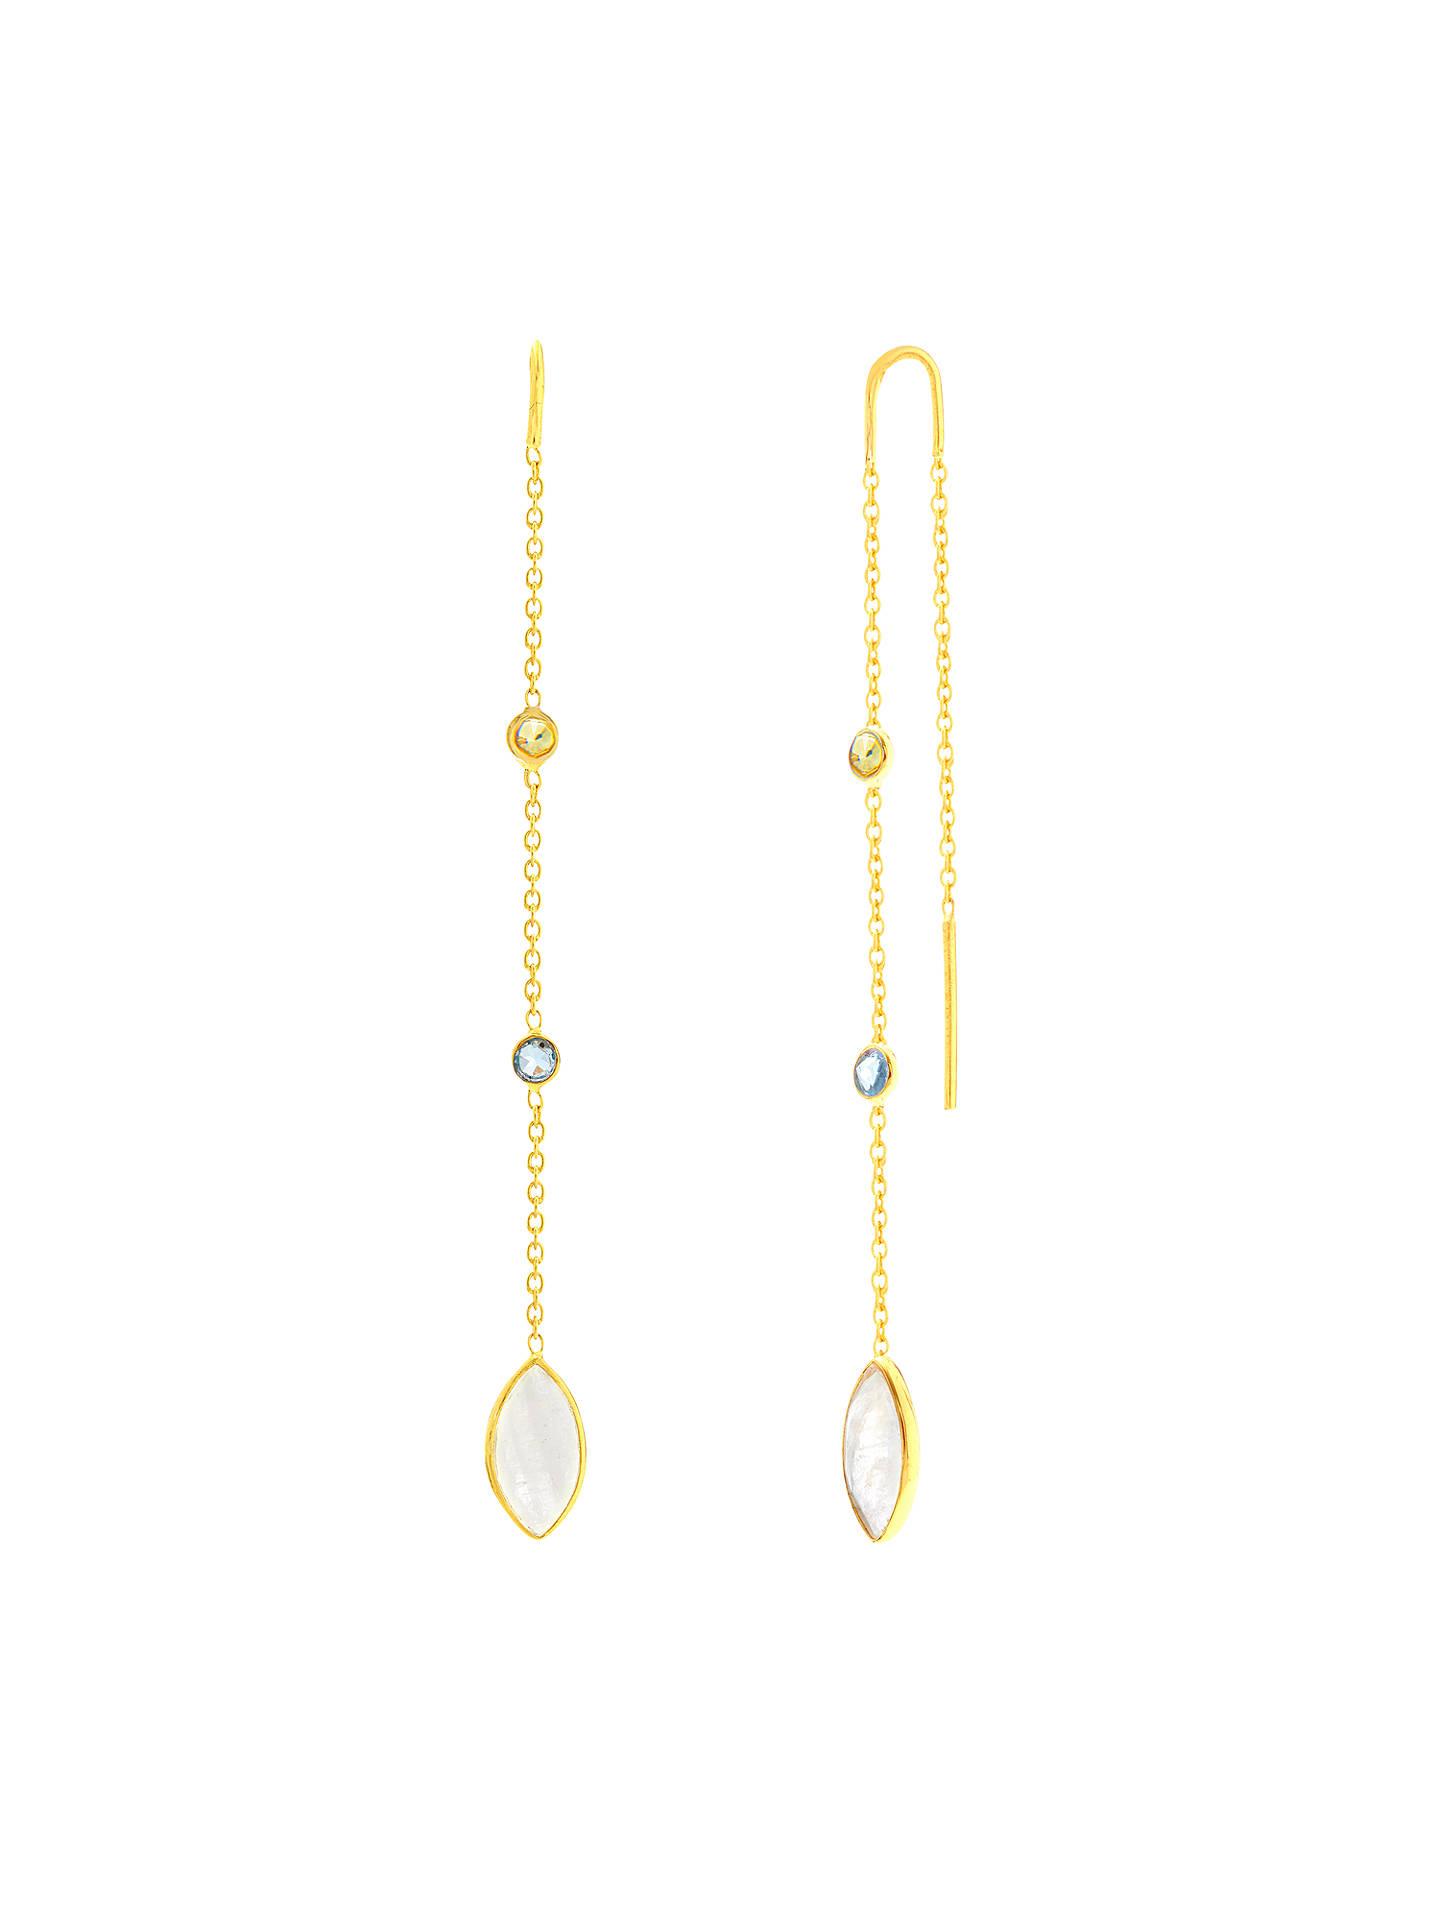 Auren 18ct Gold Vermeil Multi Gemstones Marquise Chain Drop Earrings Online